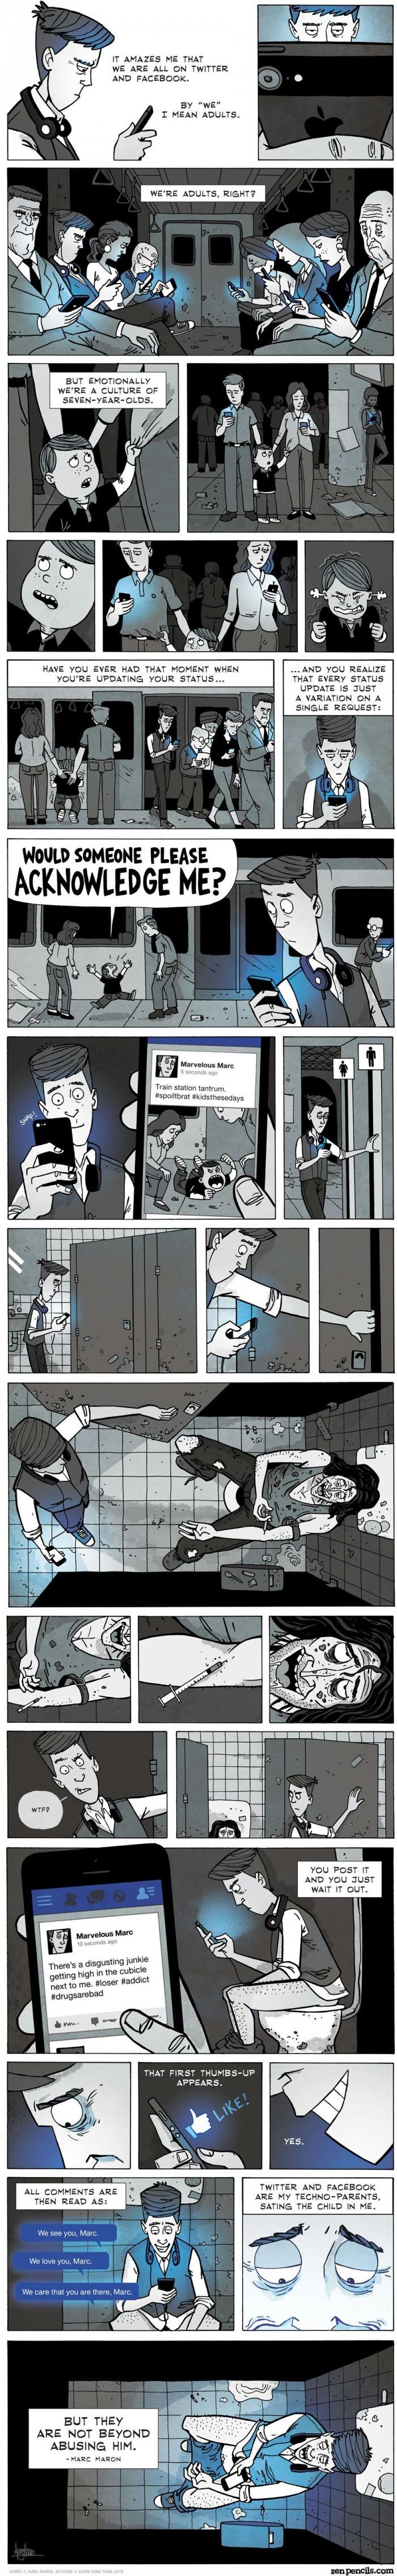 drugs_facebook